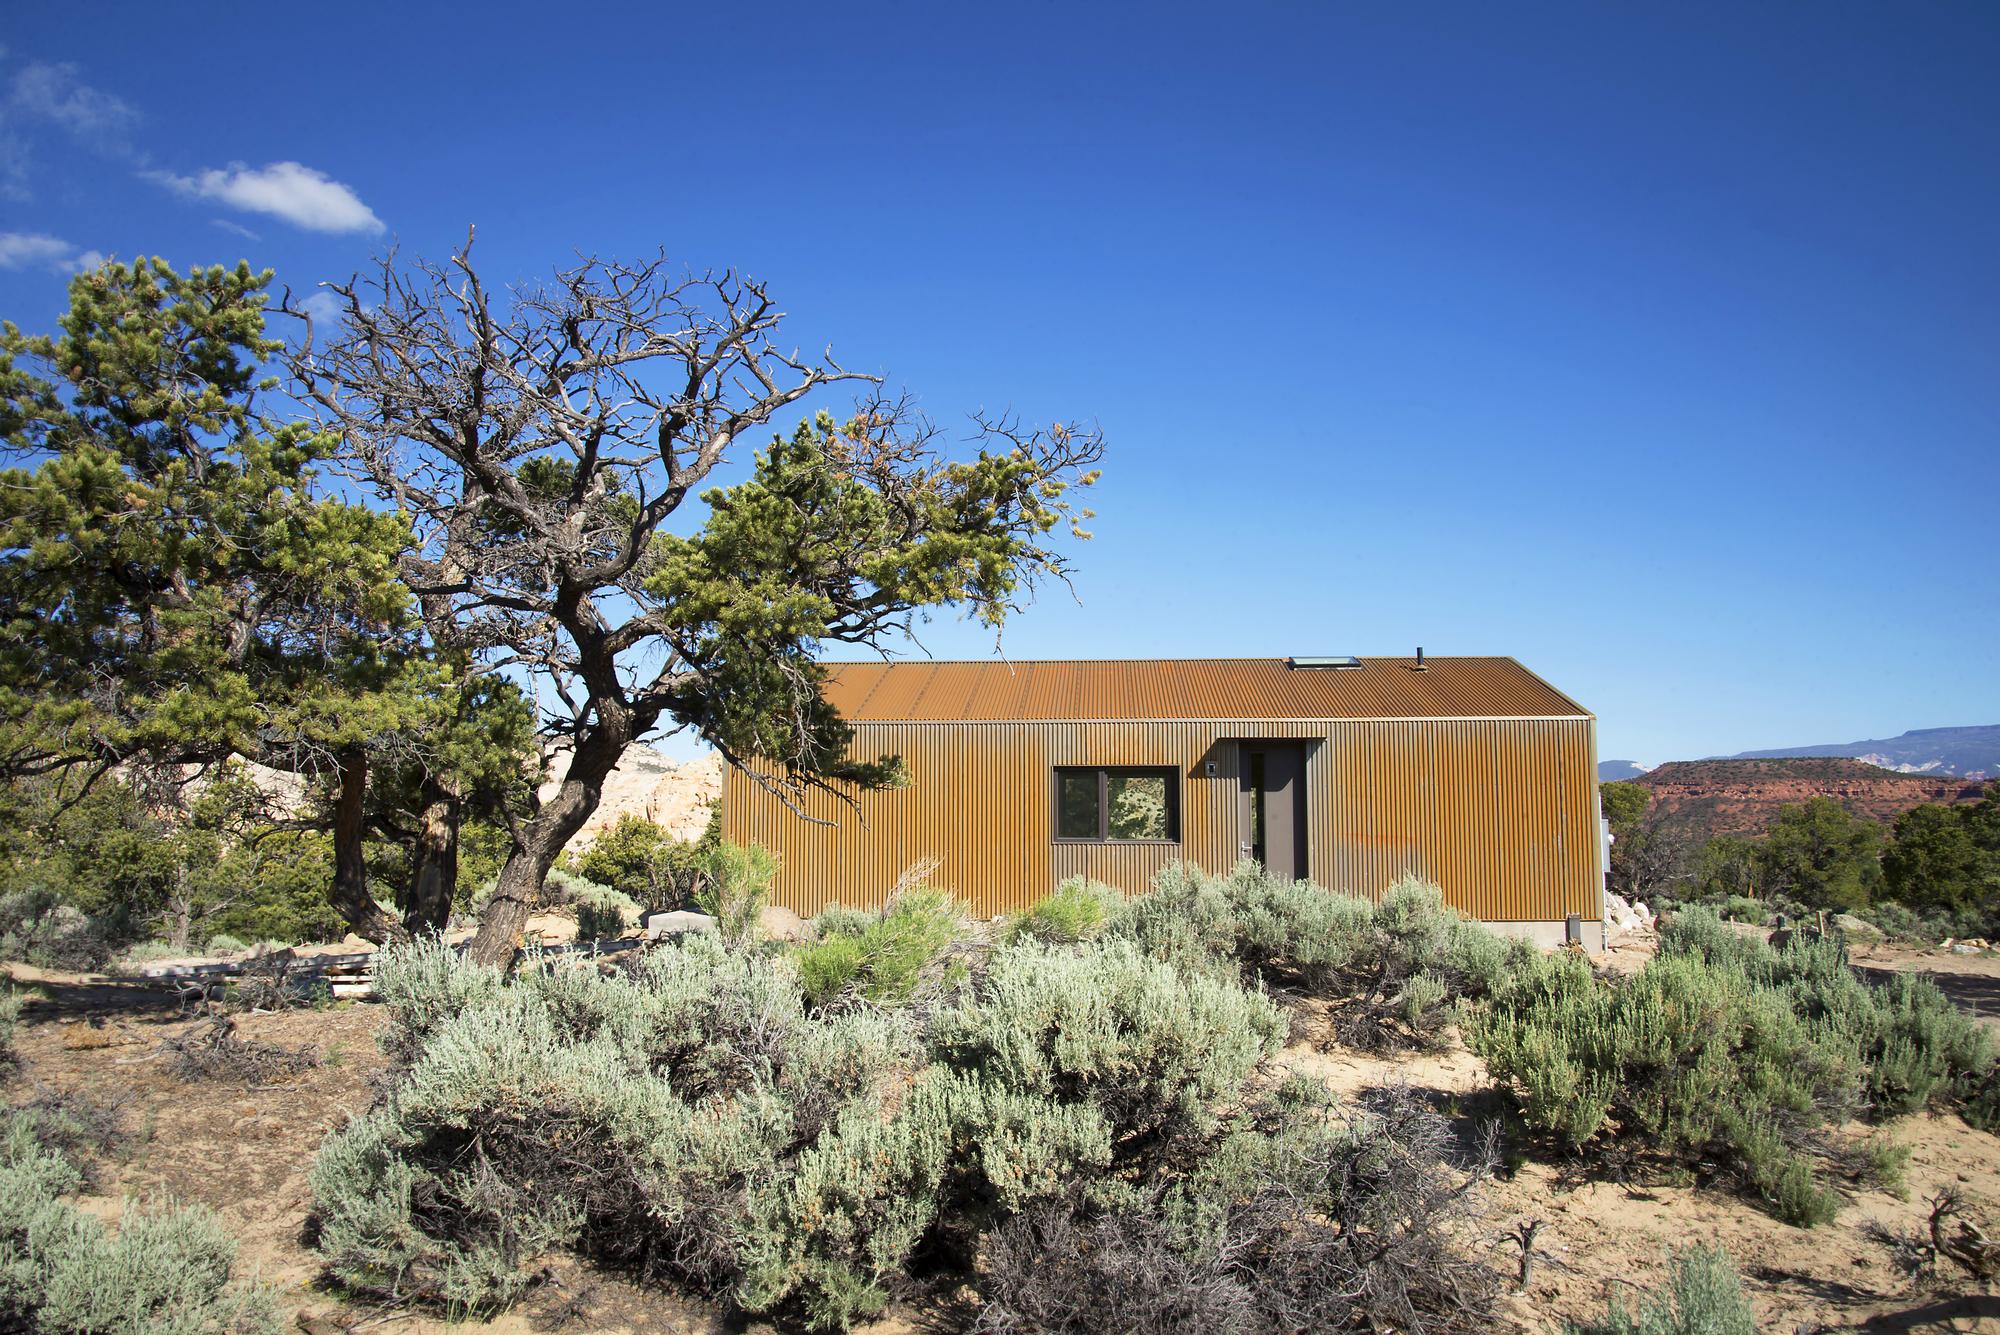 5522f900e58ecea9f8000045_capitol-reef-desert-dwelling-imbue-design_24_guest_south